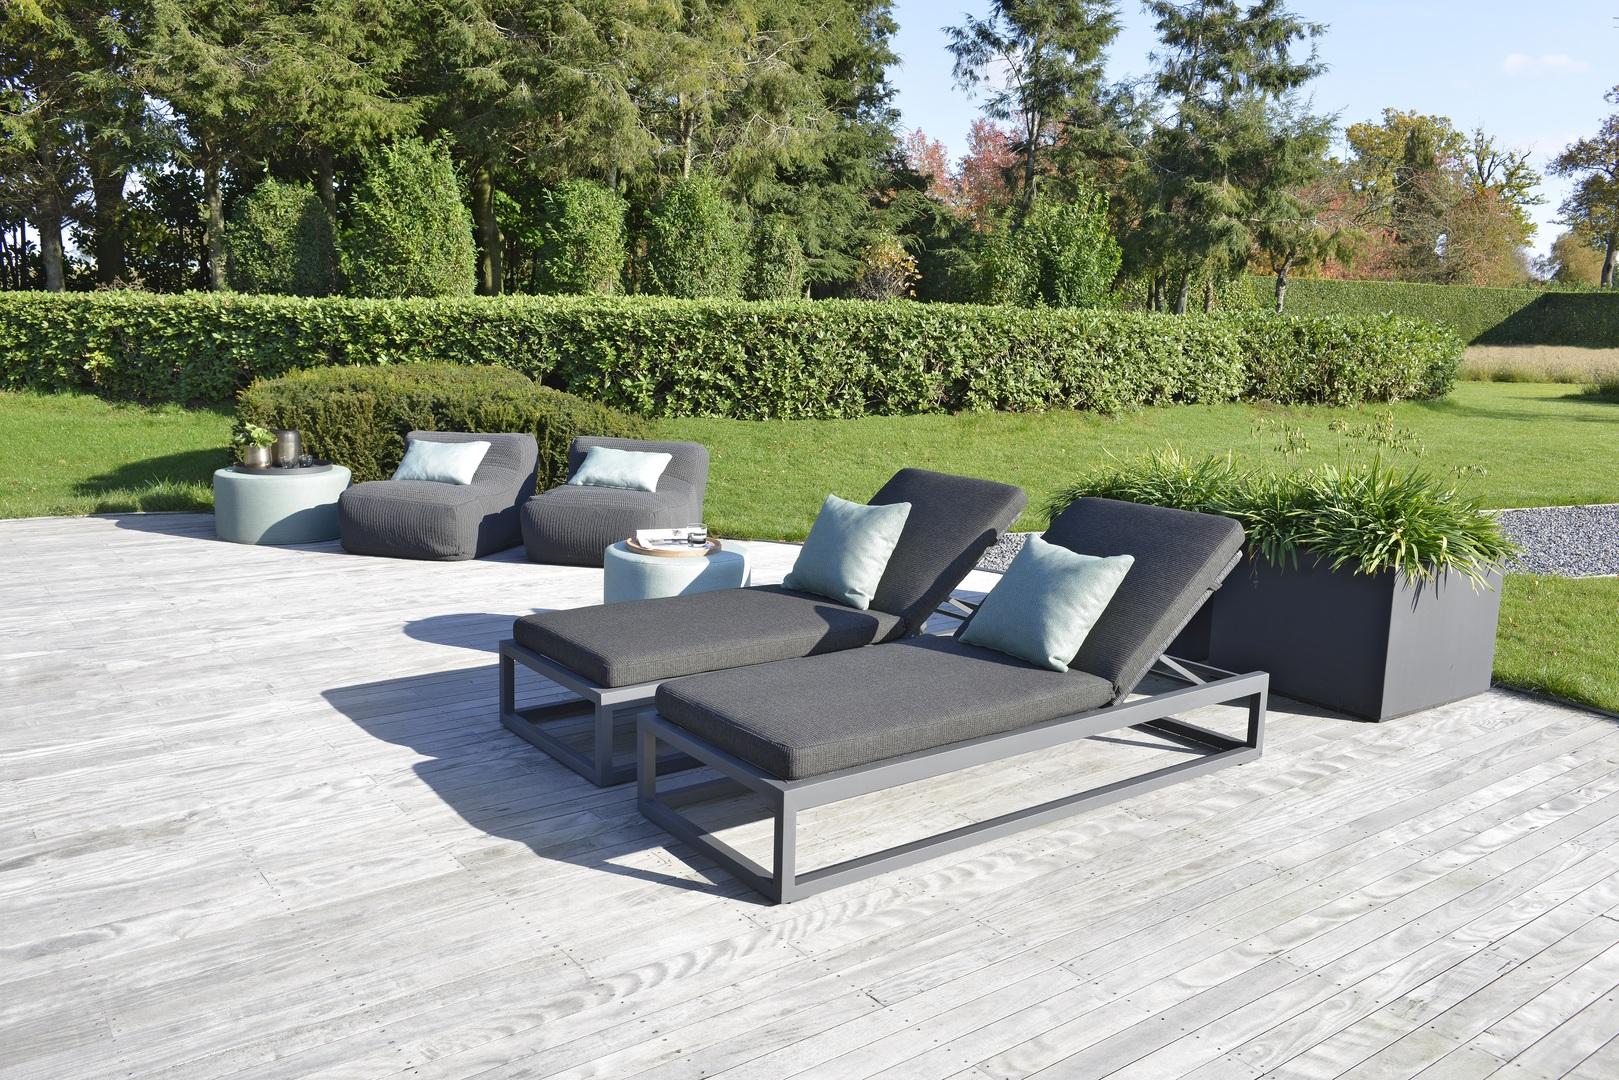 2021 Borek rope Calcara lounger dark grey & Leno bean bag anthracite - Sunbrella fabric Desio pouffes2.jpg